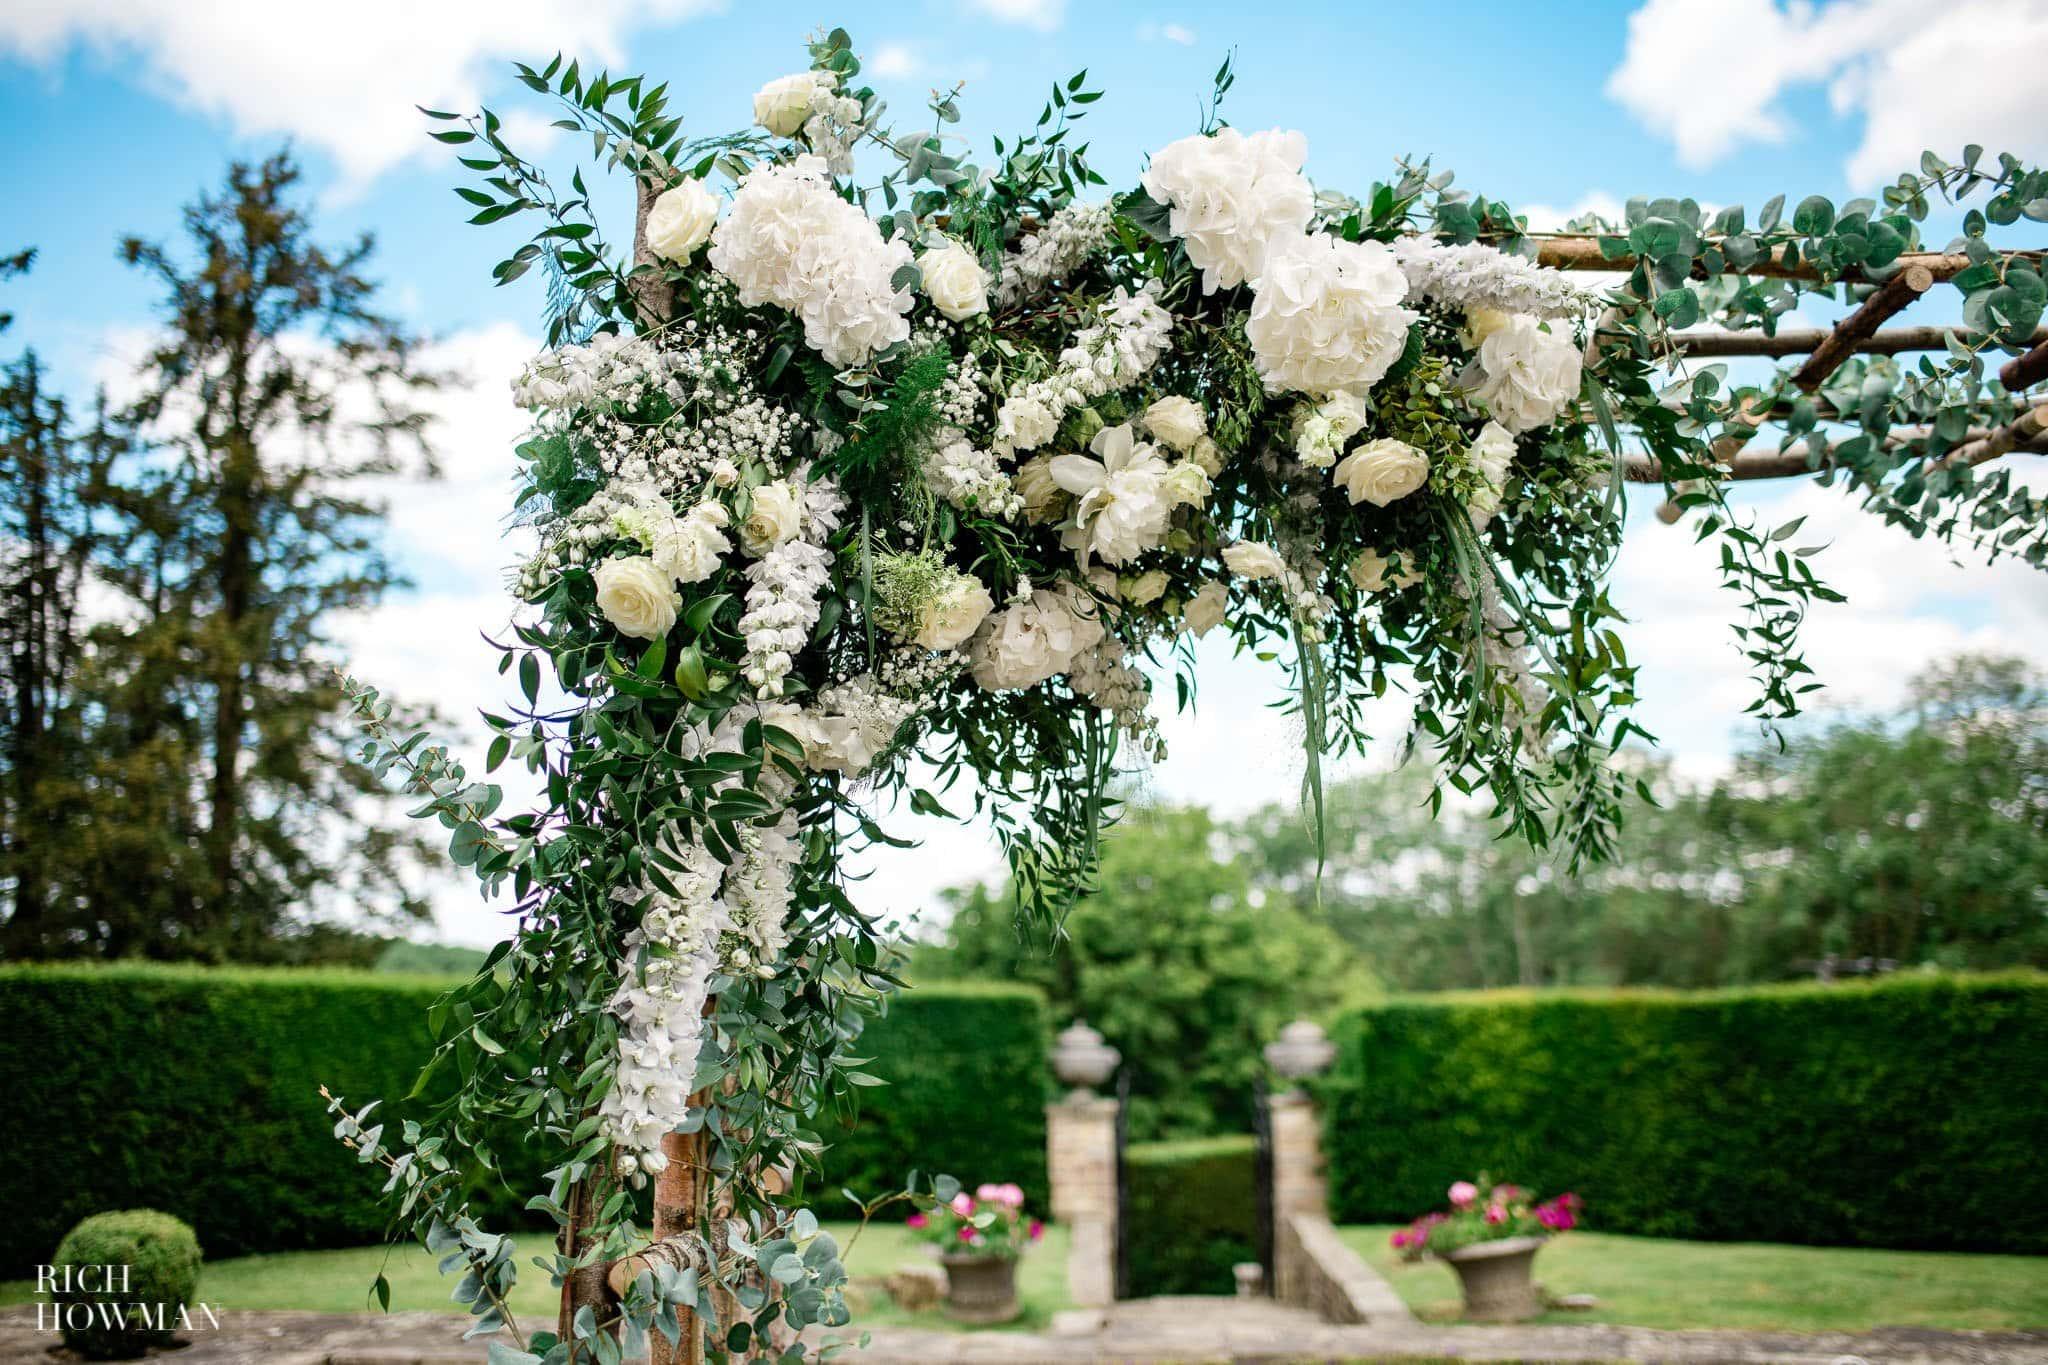 Hedsor House Wedding Photographer in Berkshire 12